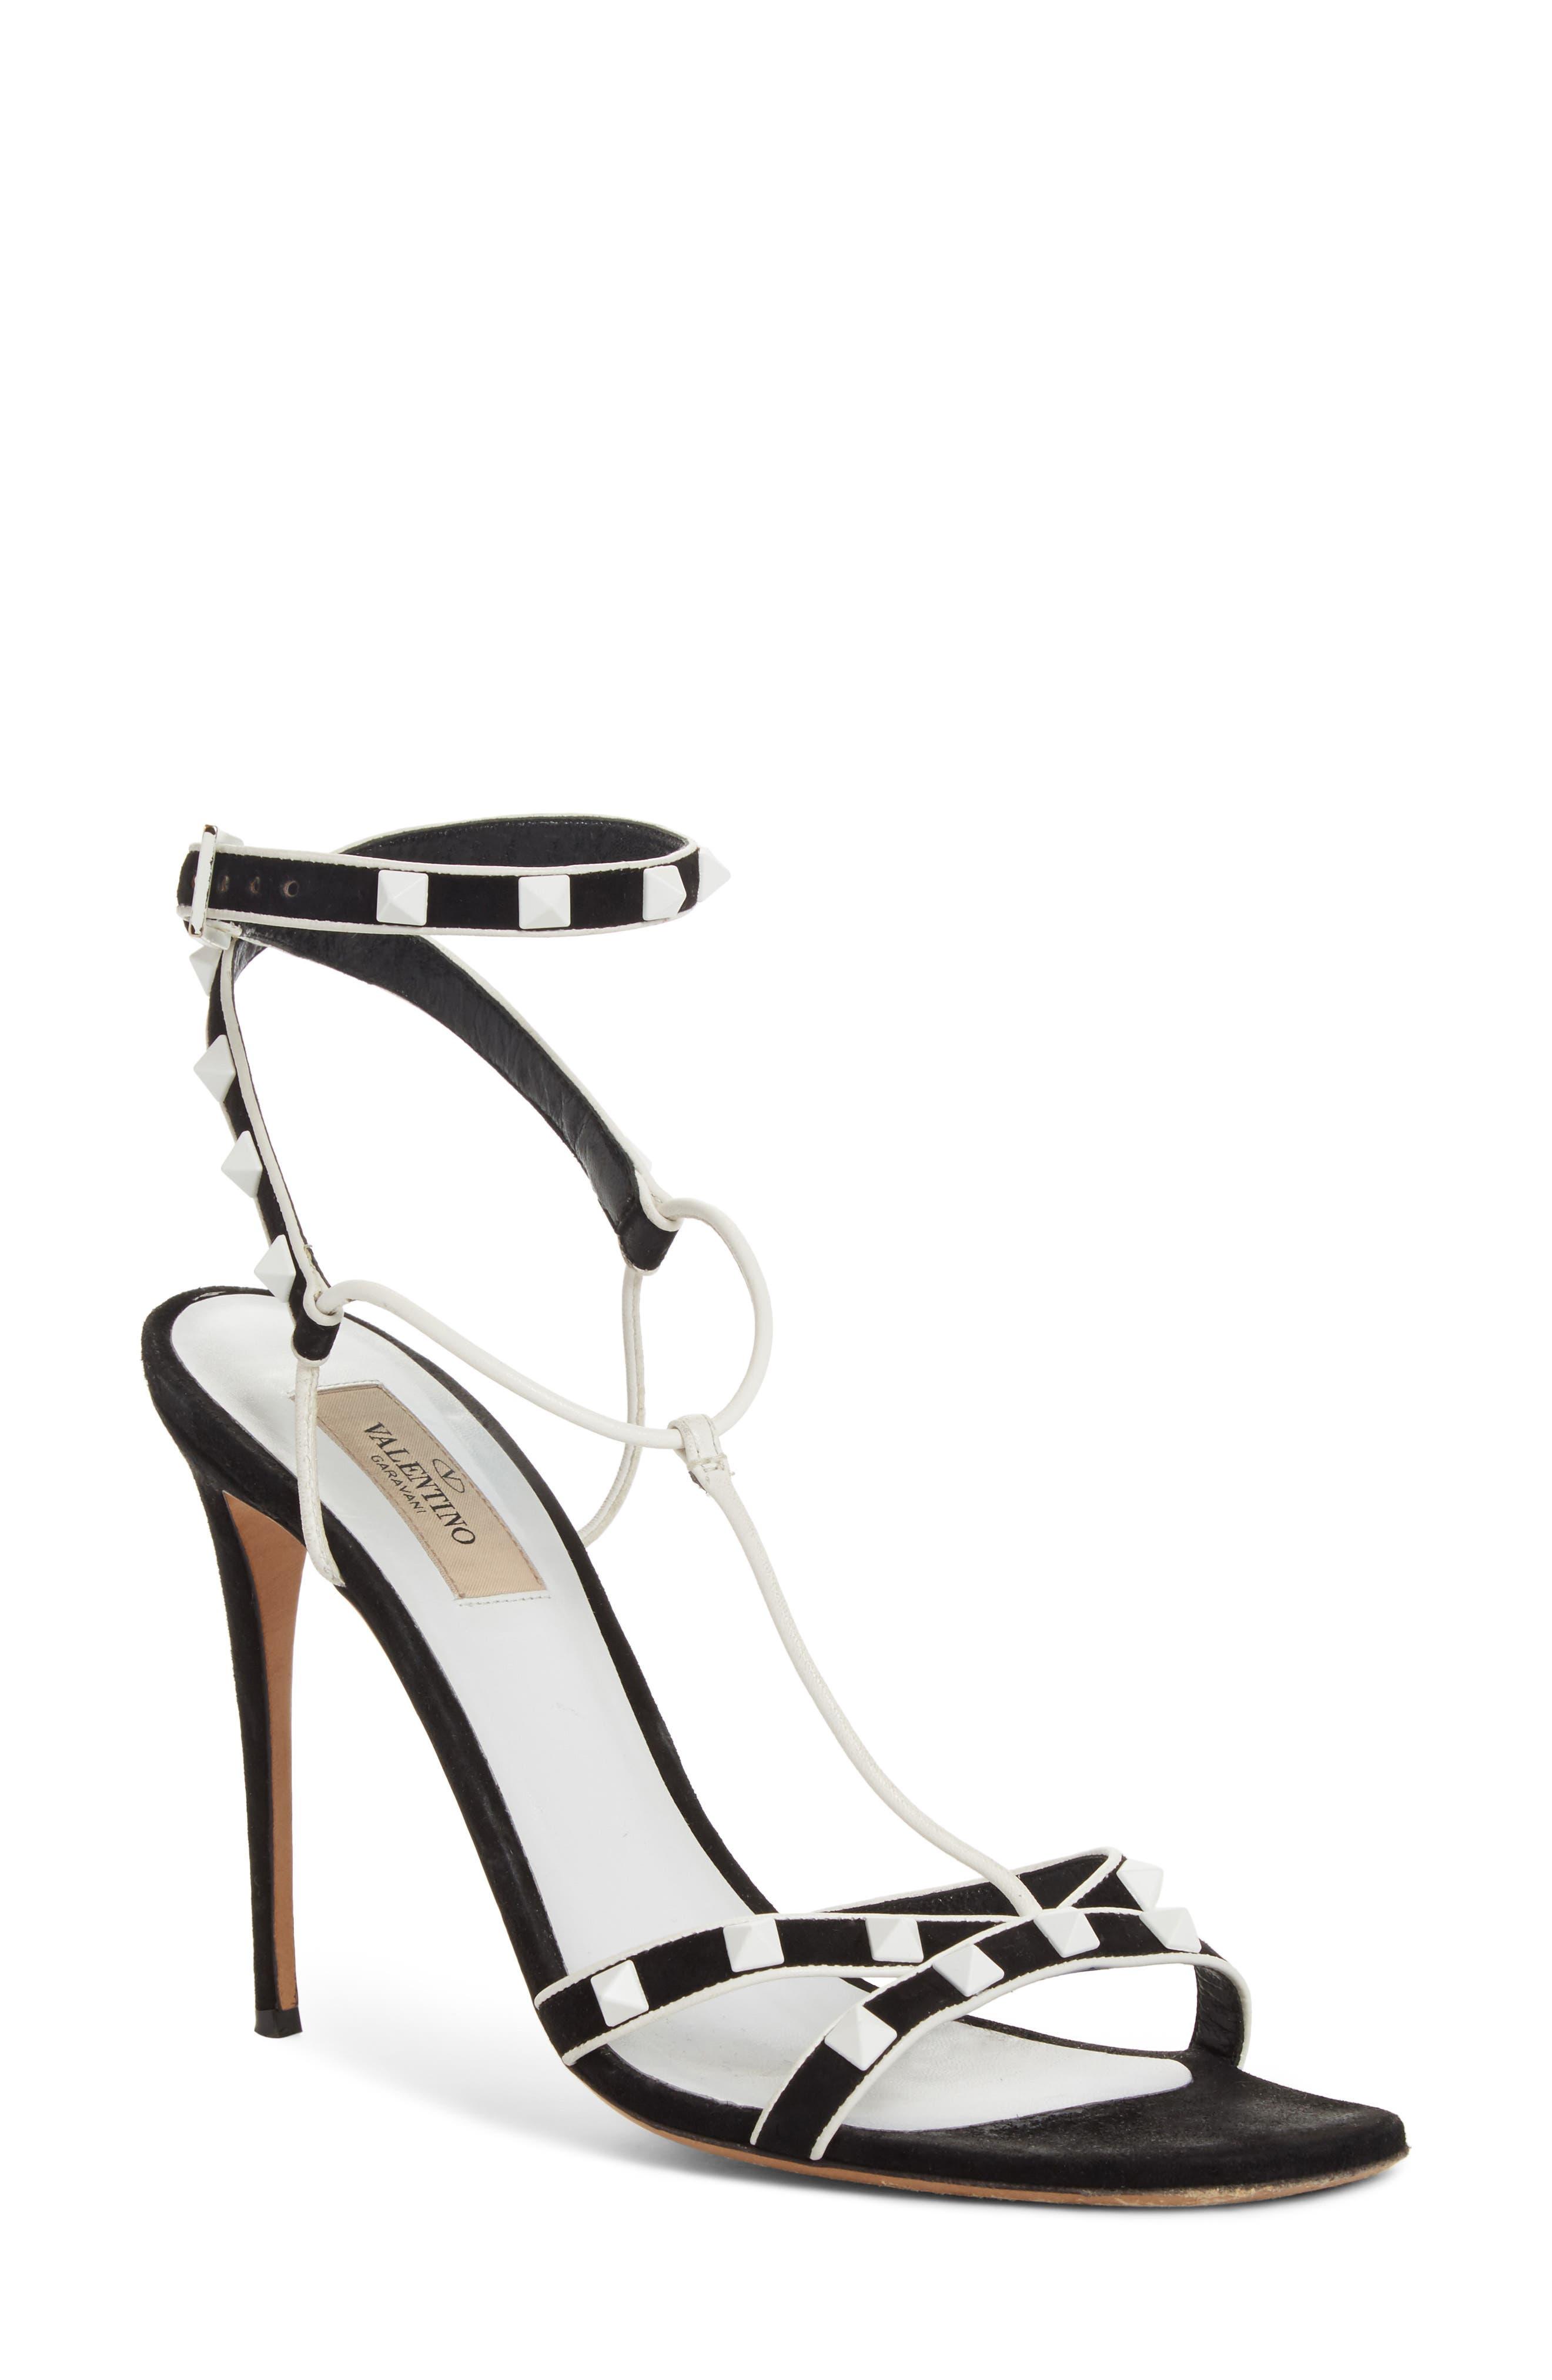 Valentino Free Rockstud T-Strap Sandal,                             Main thumbnail 1, color,                             002